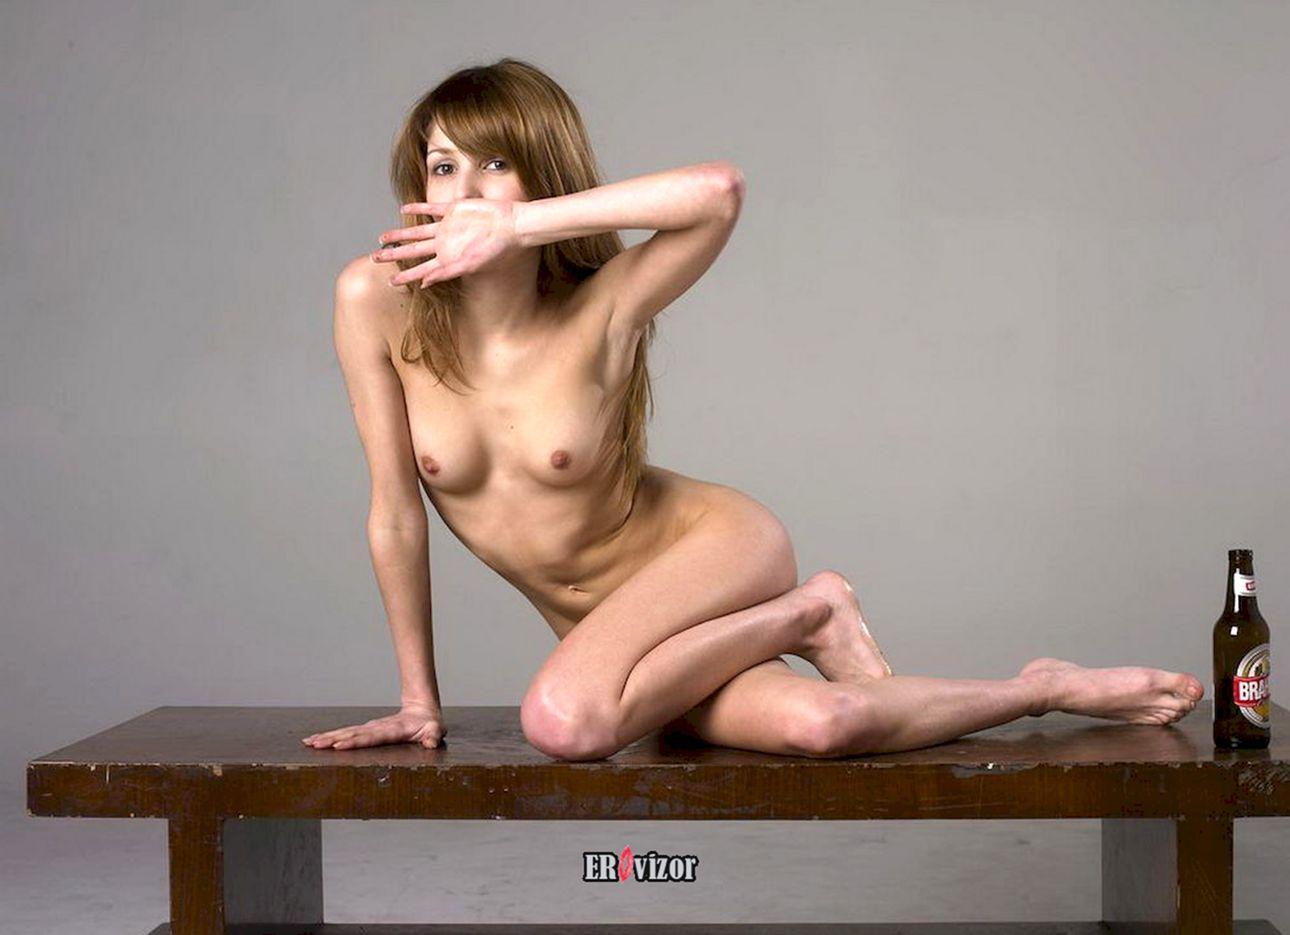 beer_naked women (4)